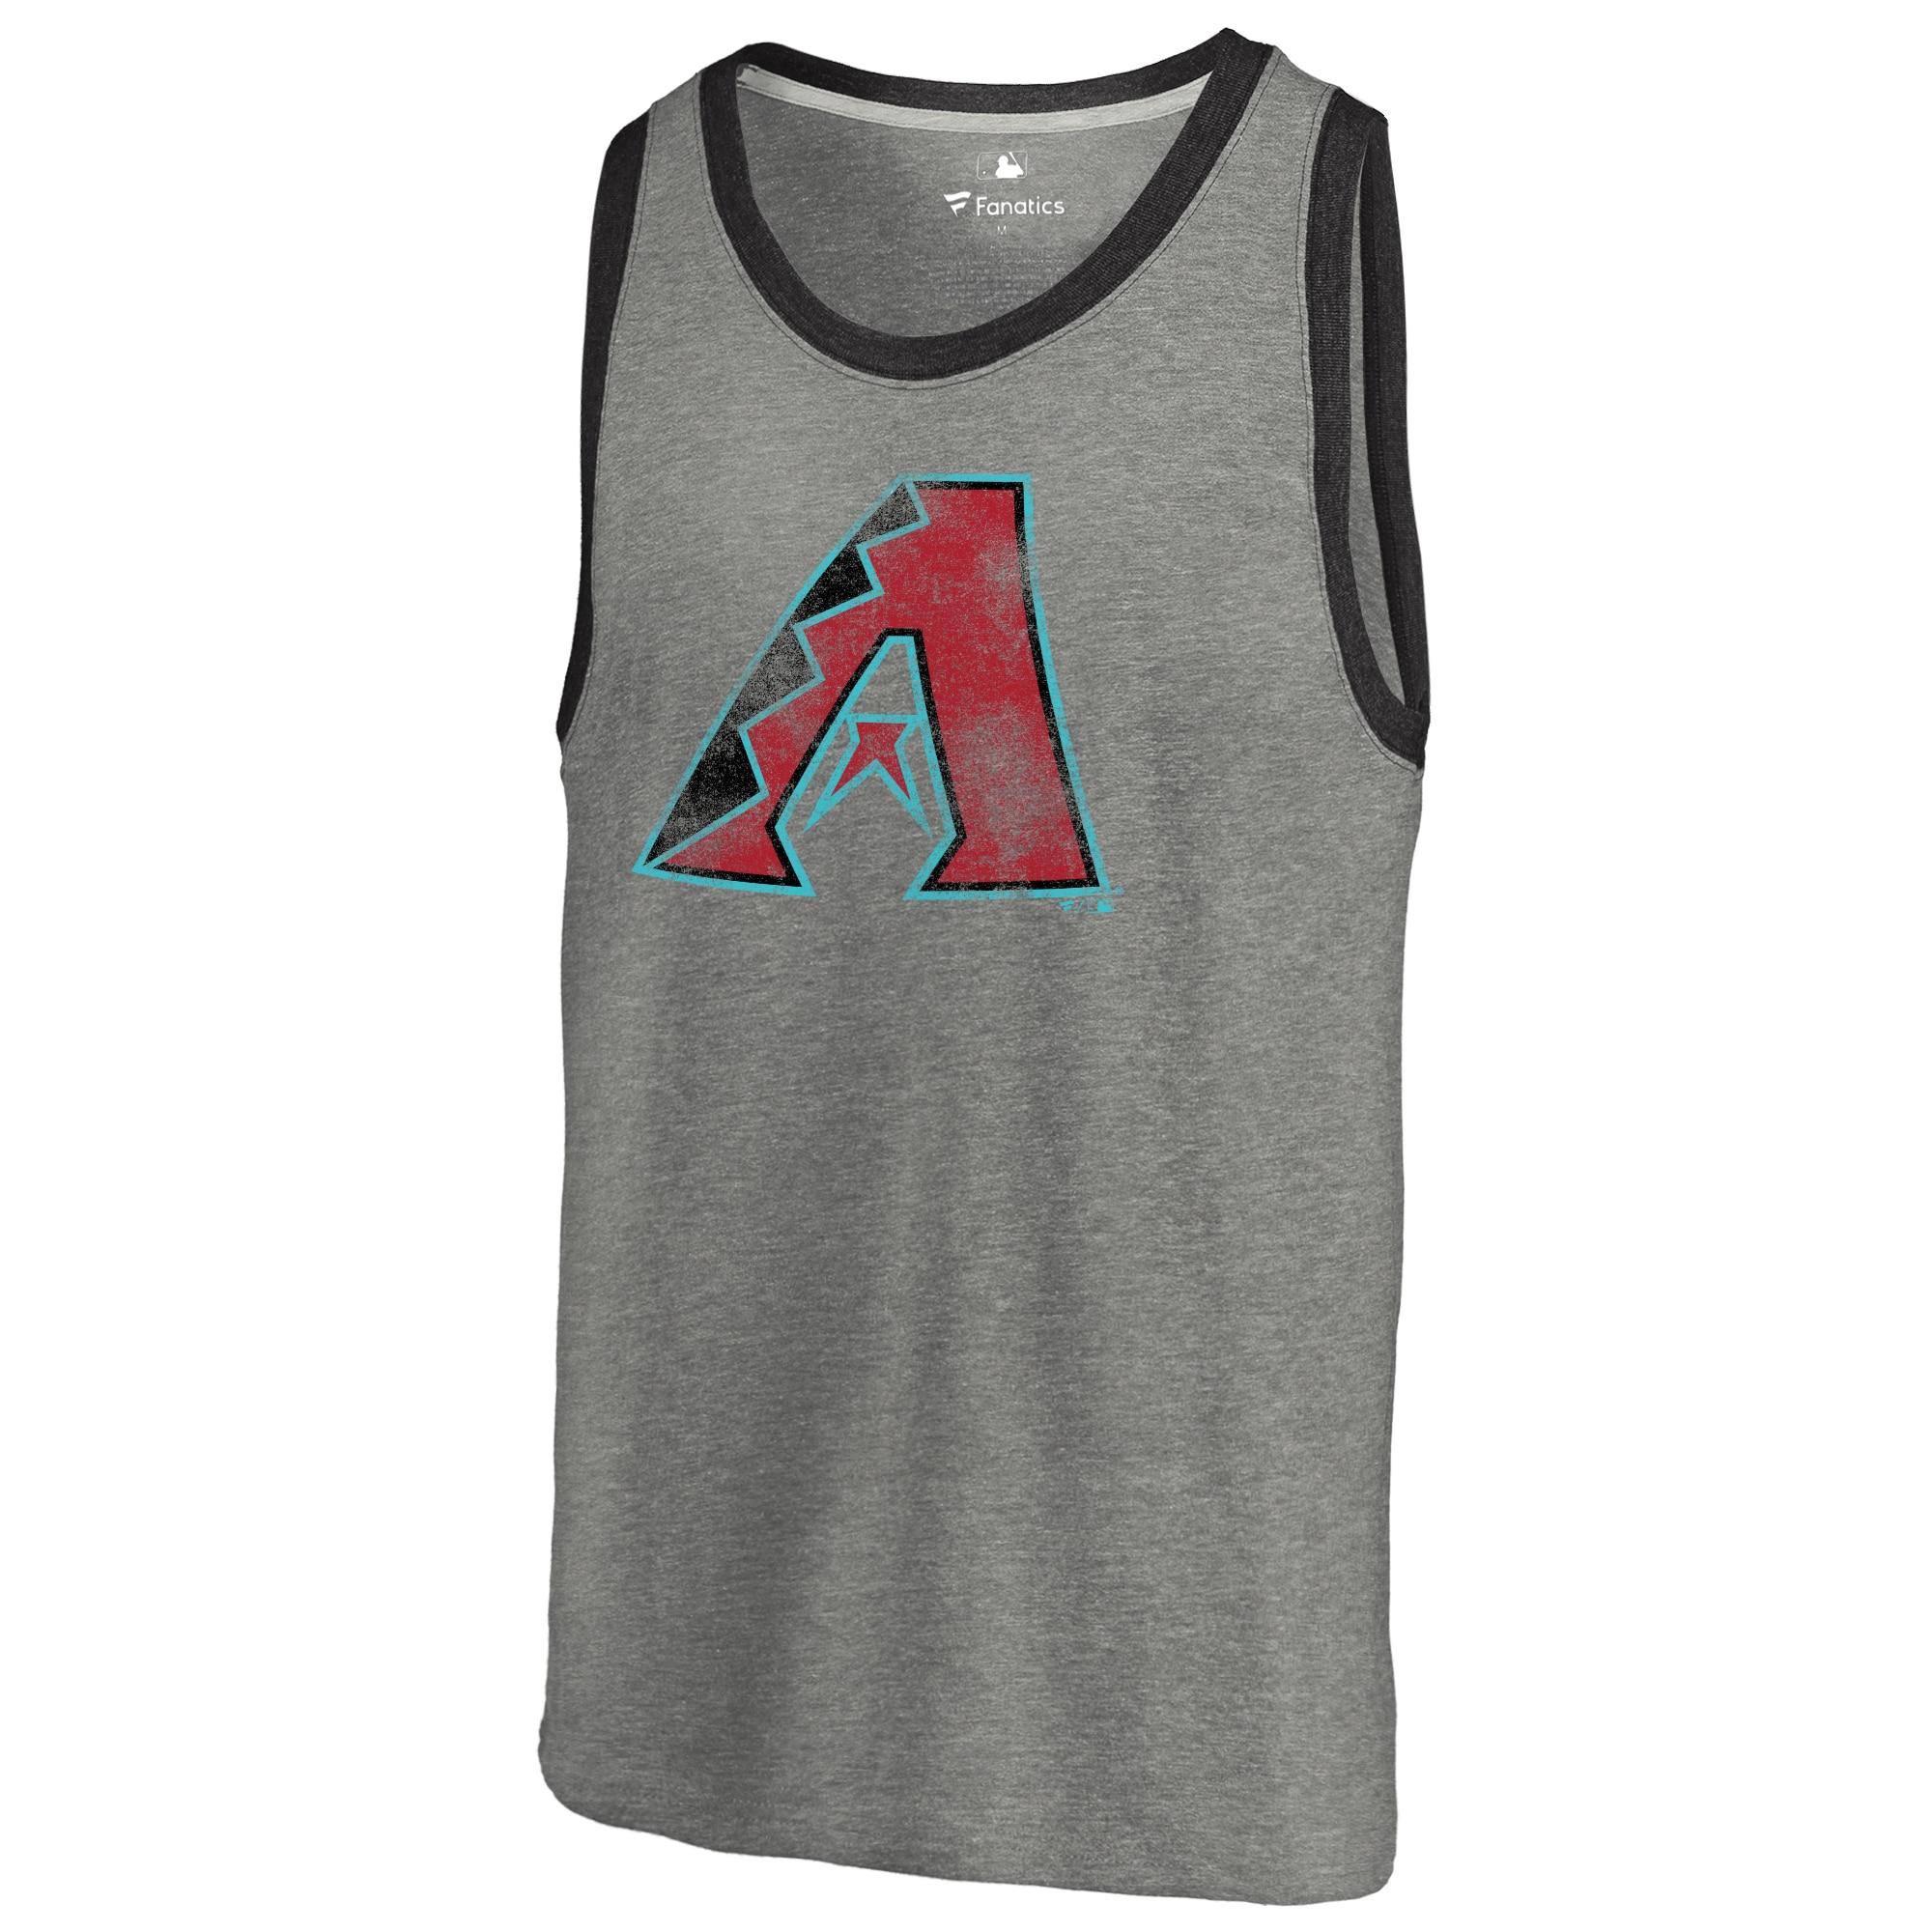 Arizona Diamondbacks Distressed Team Tank Top - Ash